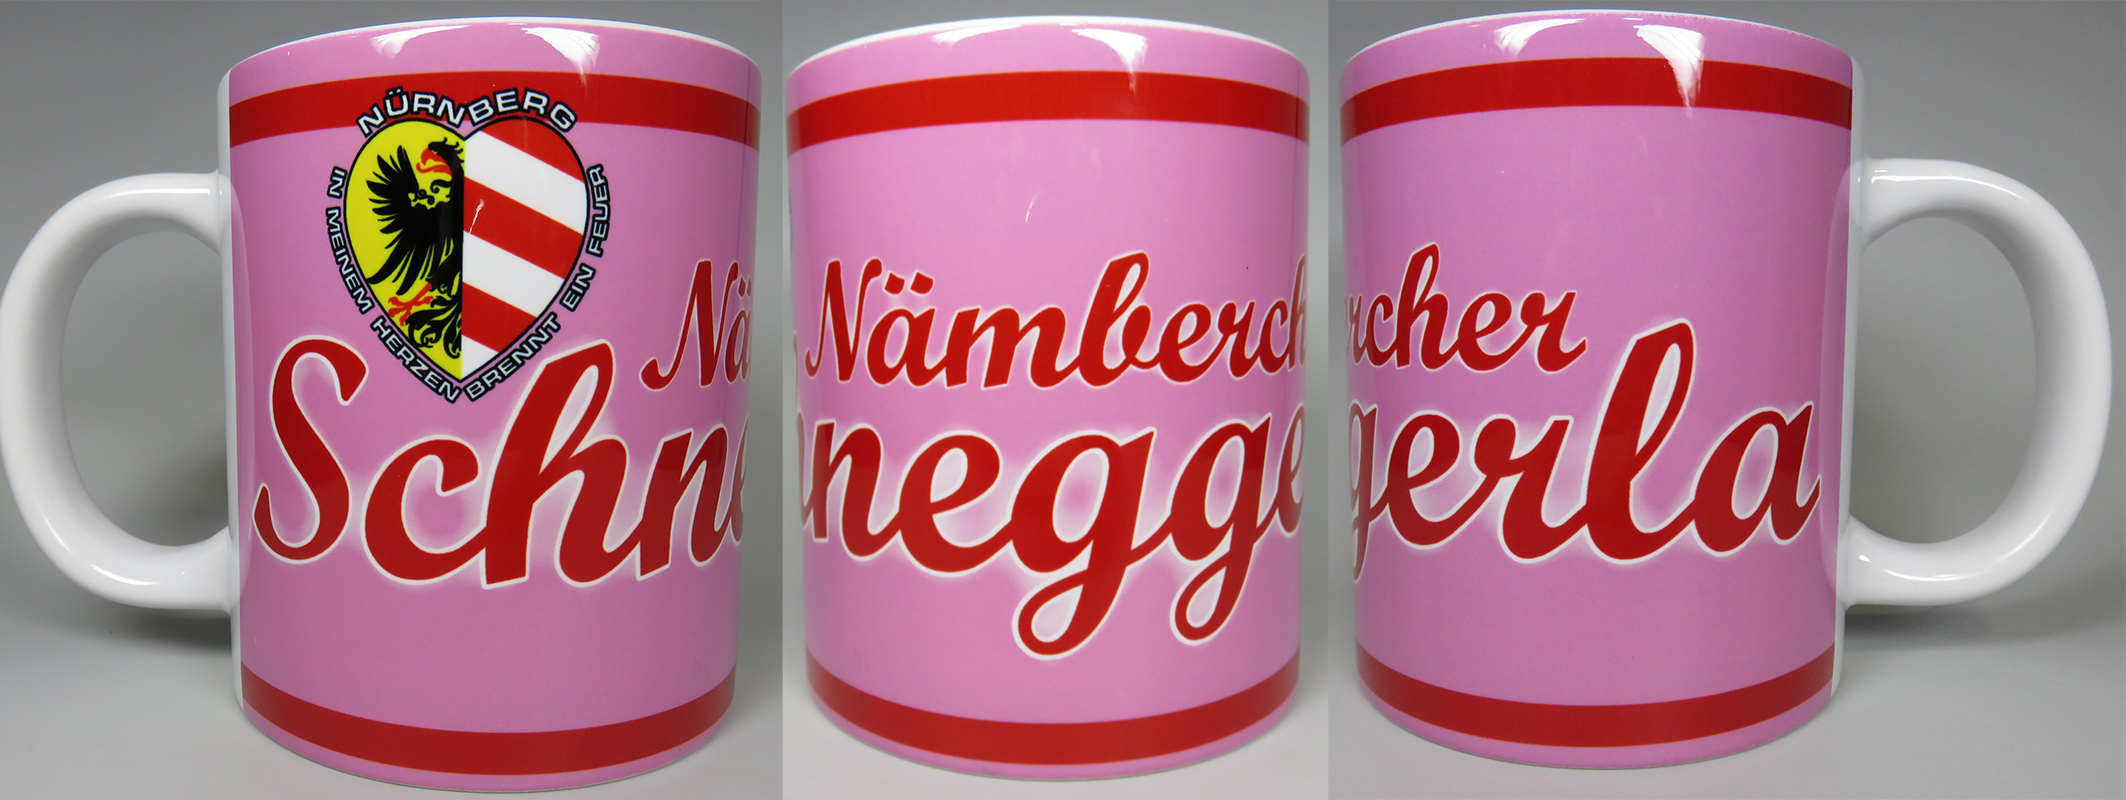 Jumbo Tasse 0,5 Liter  Nämbercher Schneggerla